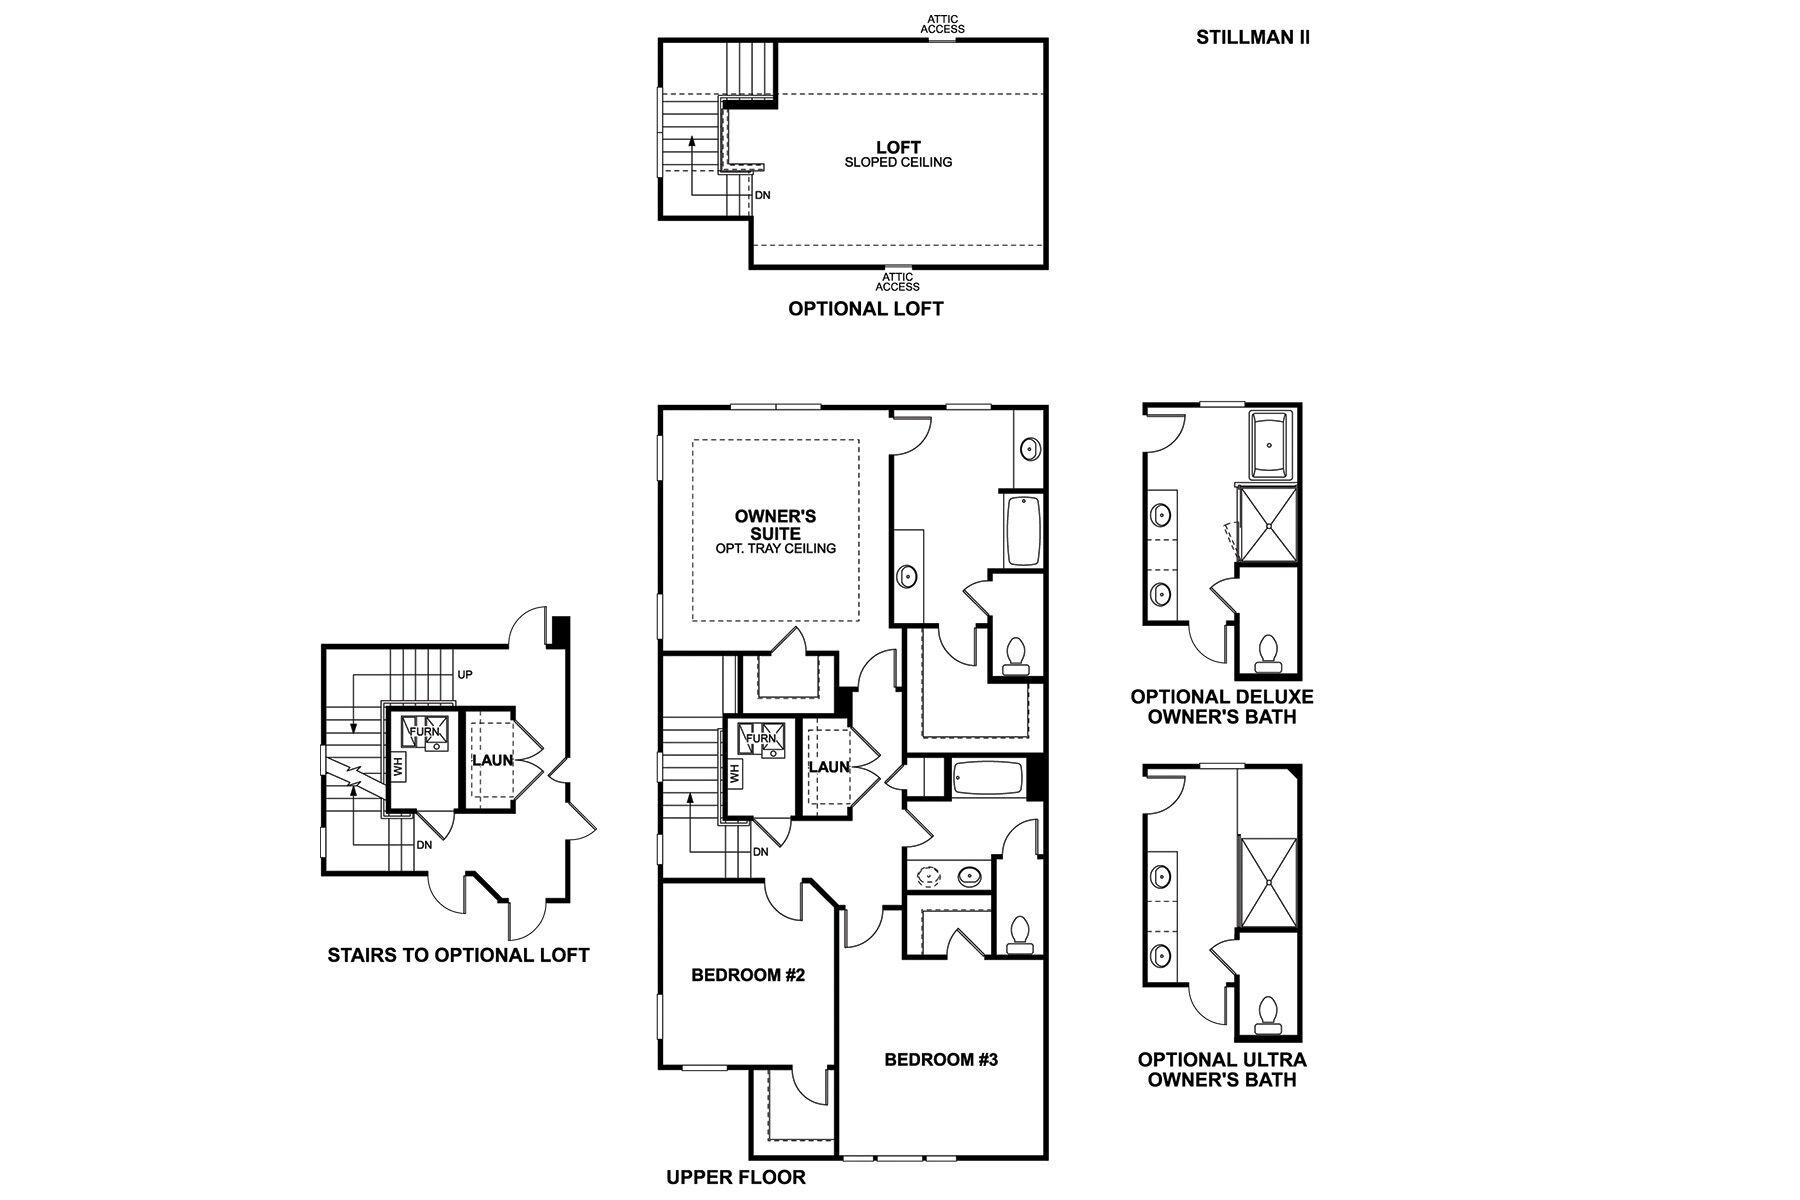 Stillman II Second Floor